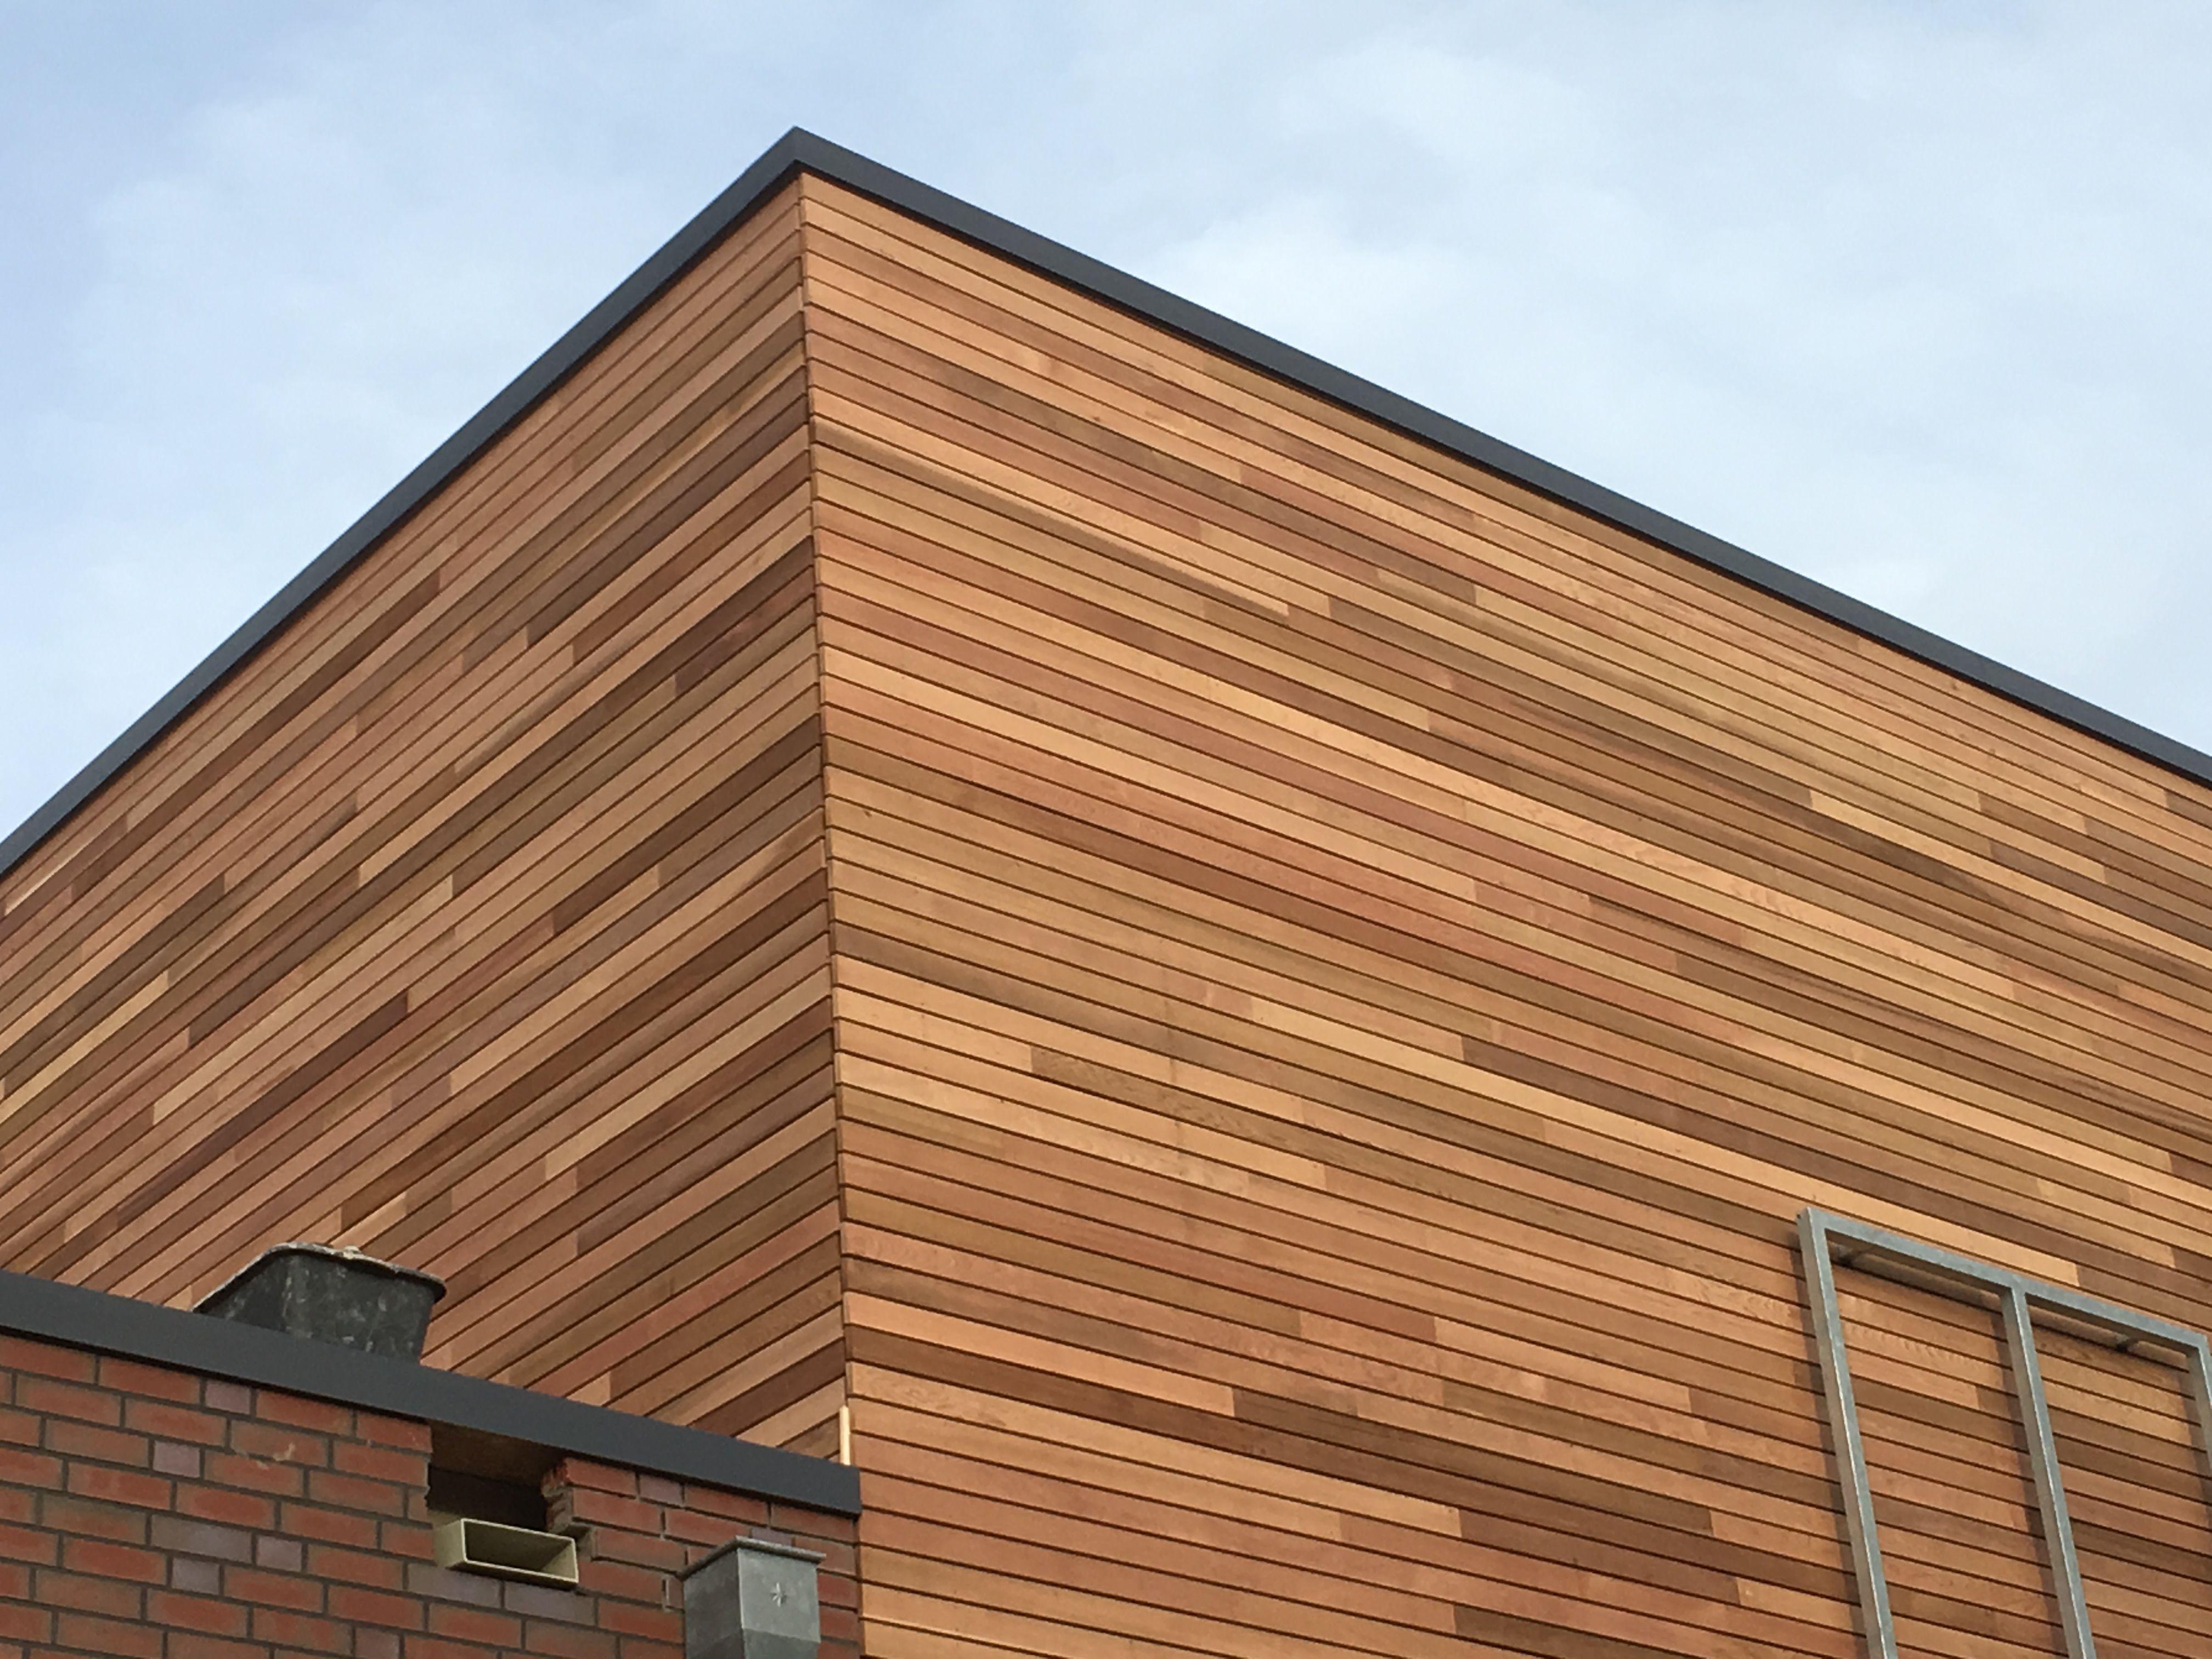 Purecedar Holzfassade Fassade Haus Umbau